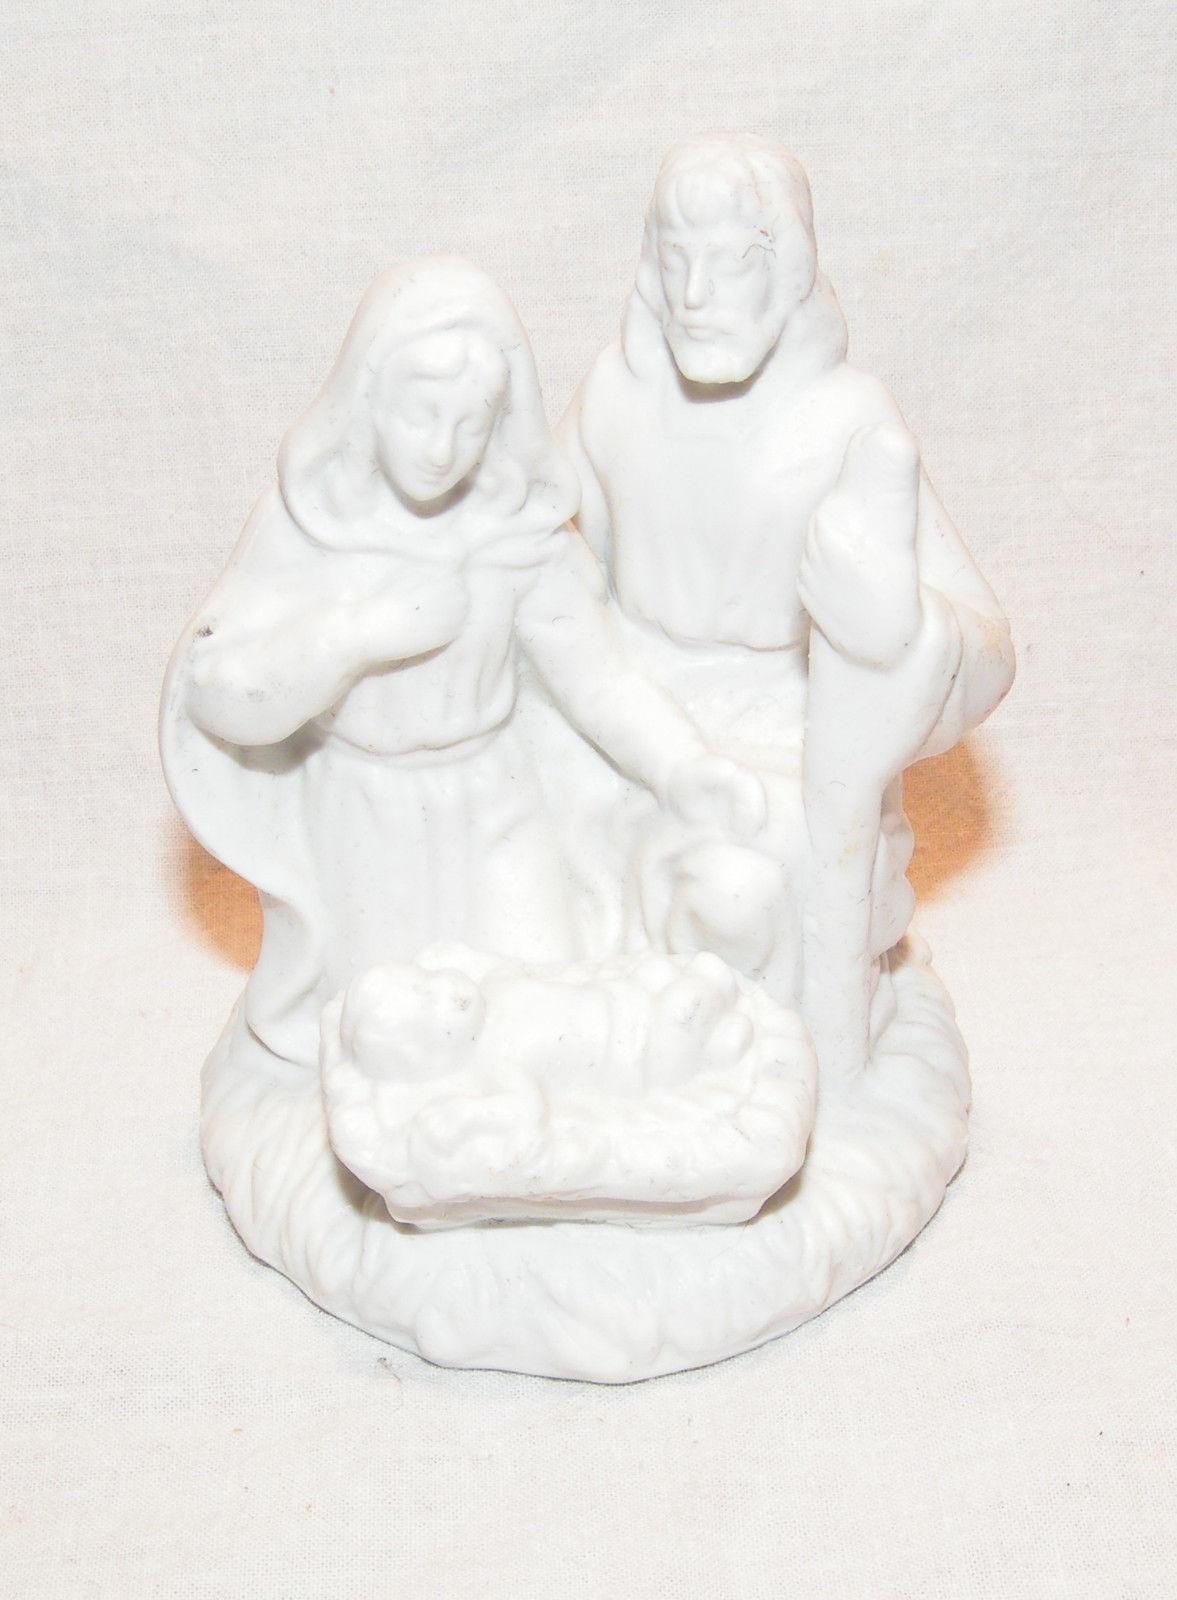 Reduced Sale Nativity Figurine Mary Joseph Jesus White Porcelain Christmas